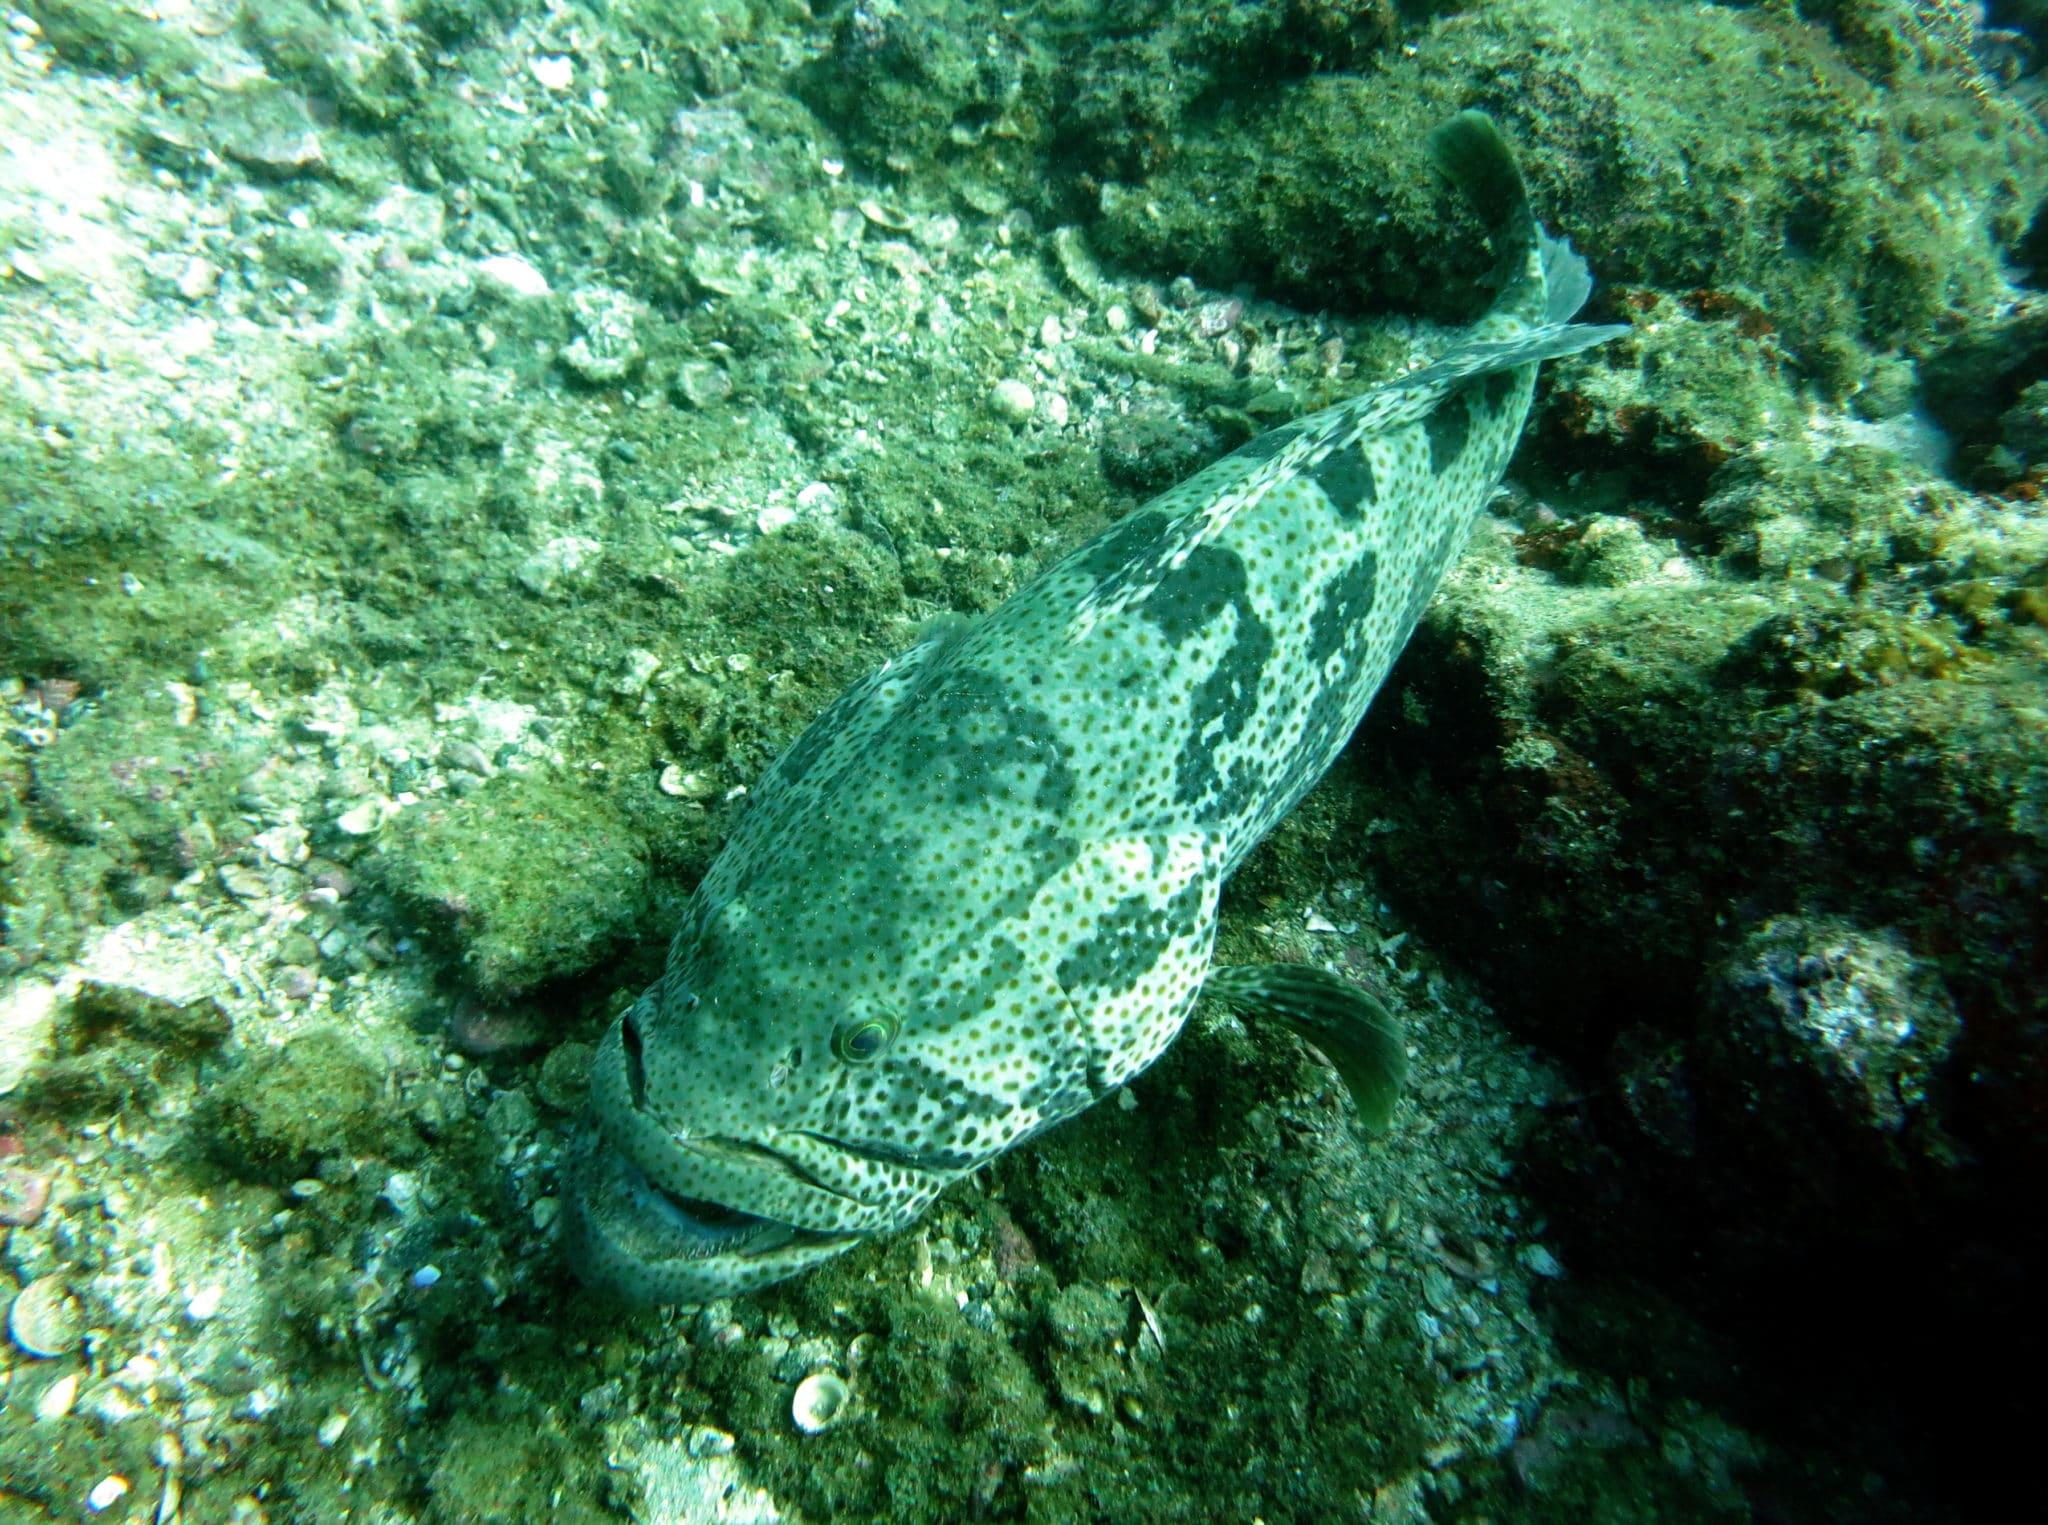 Netrani Island - Diving in India